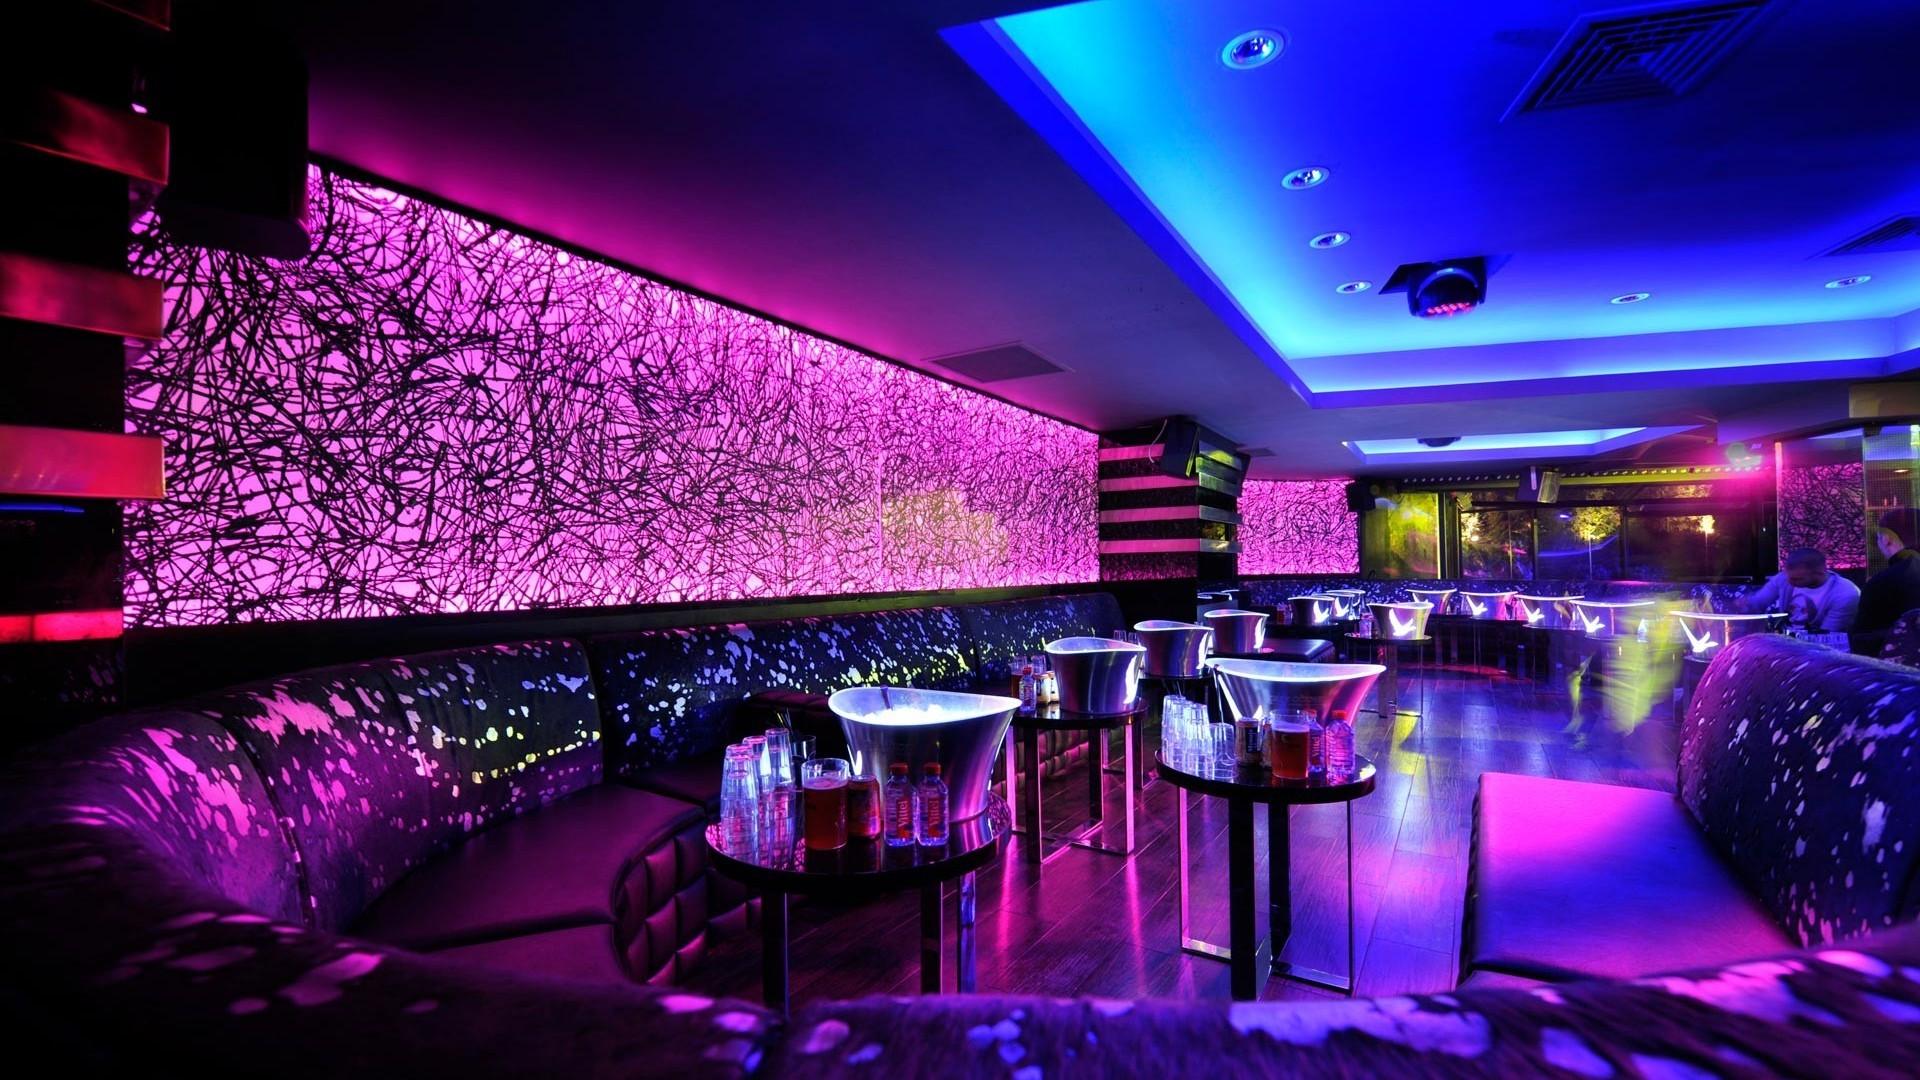 club background hd desktop night lounge neon wonderful lights wallpapers wallpapertag resolution